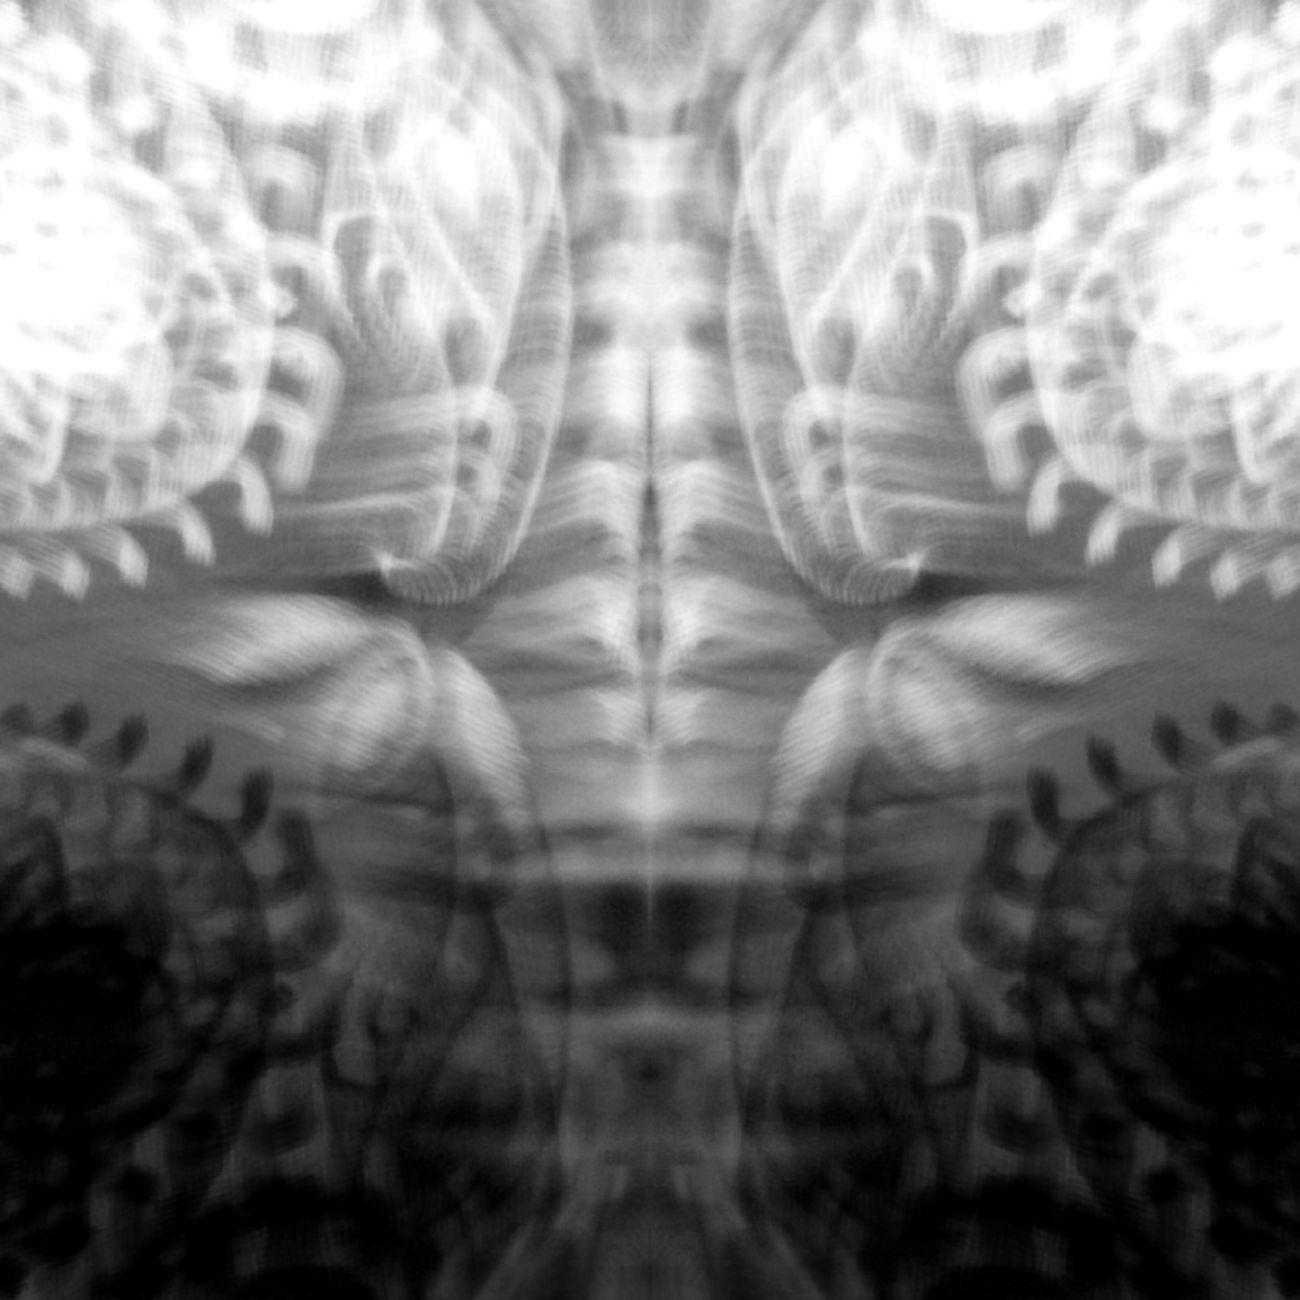 Trust_the_process Abstract Blackandwhite Monochrome